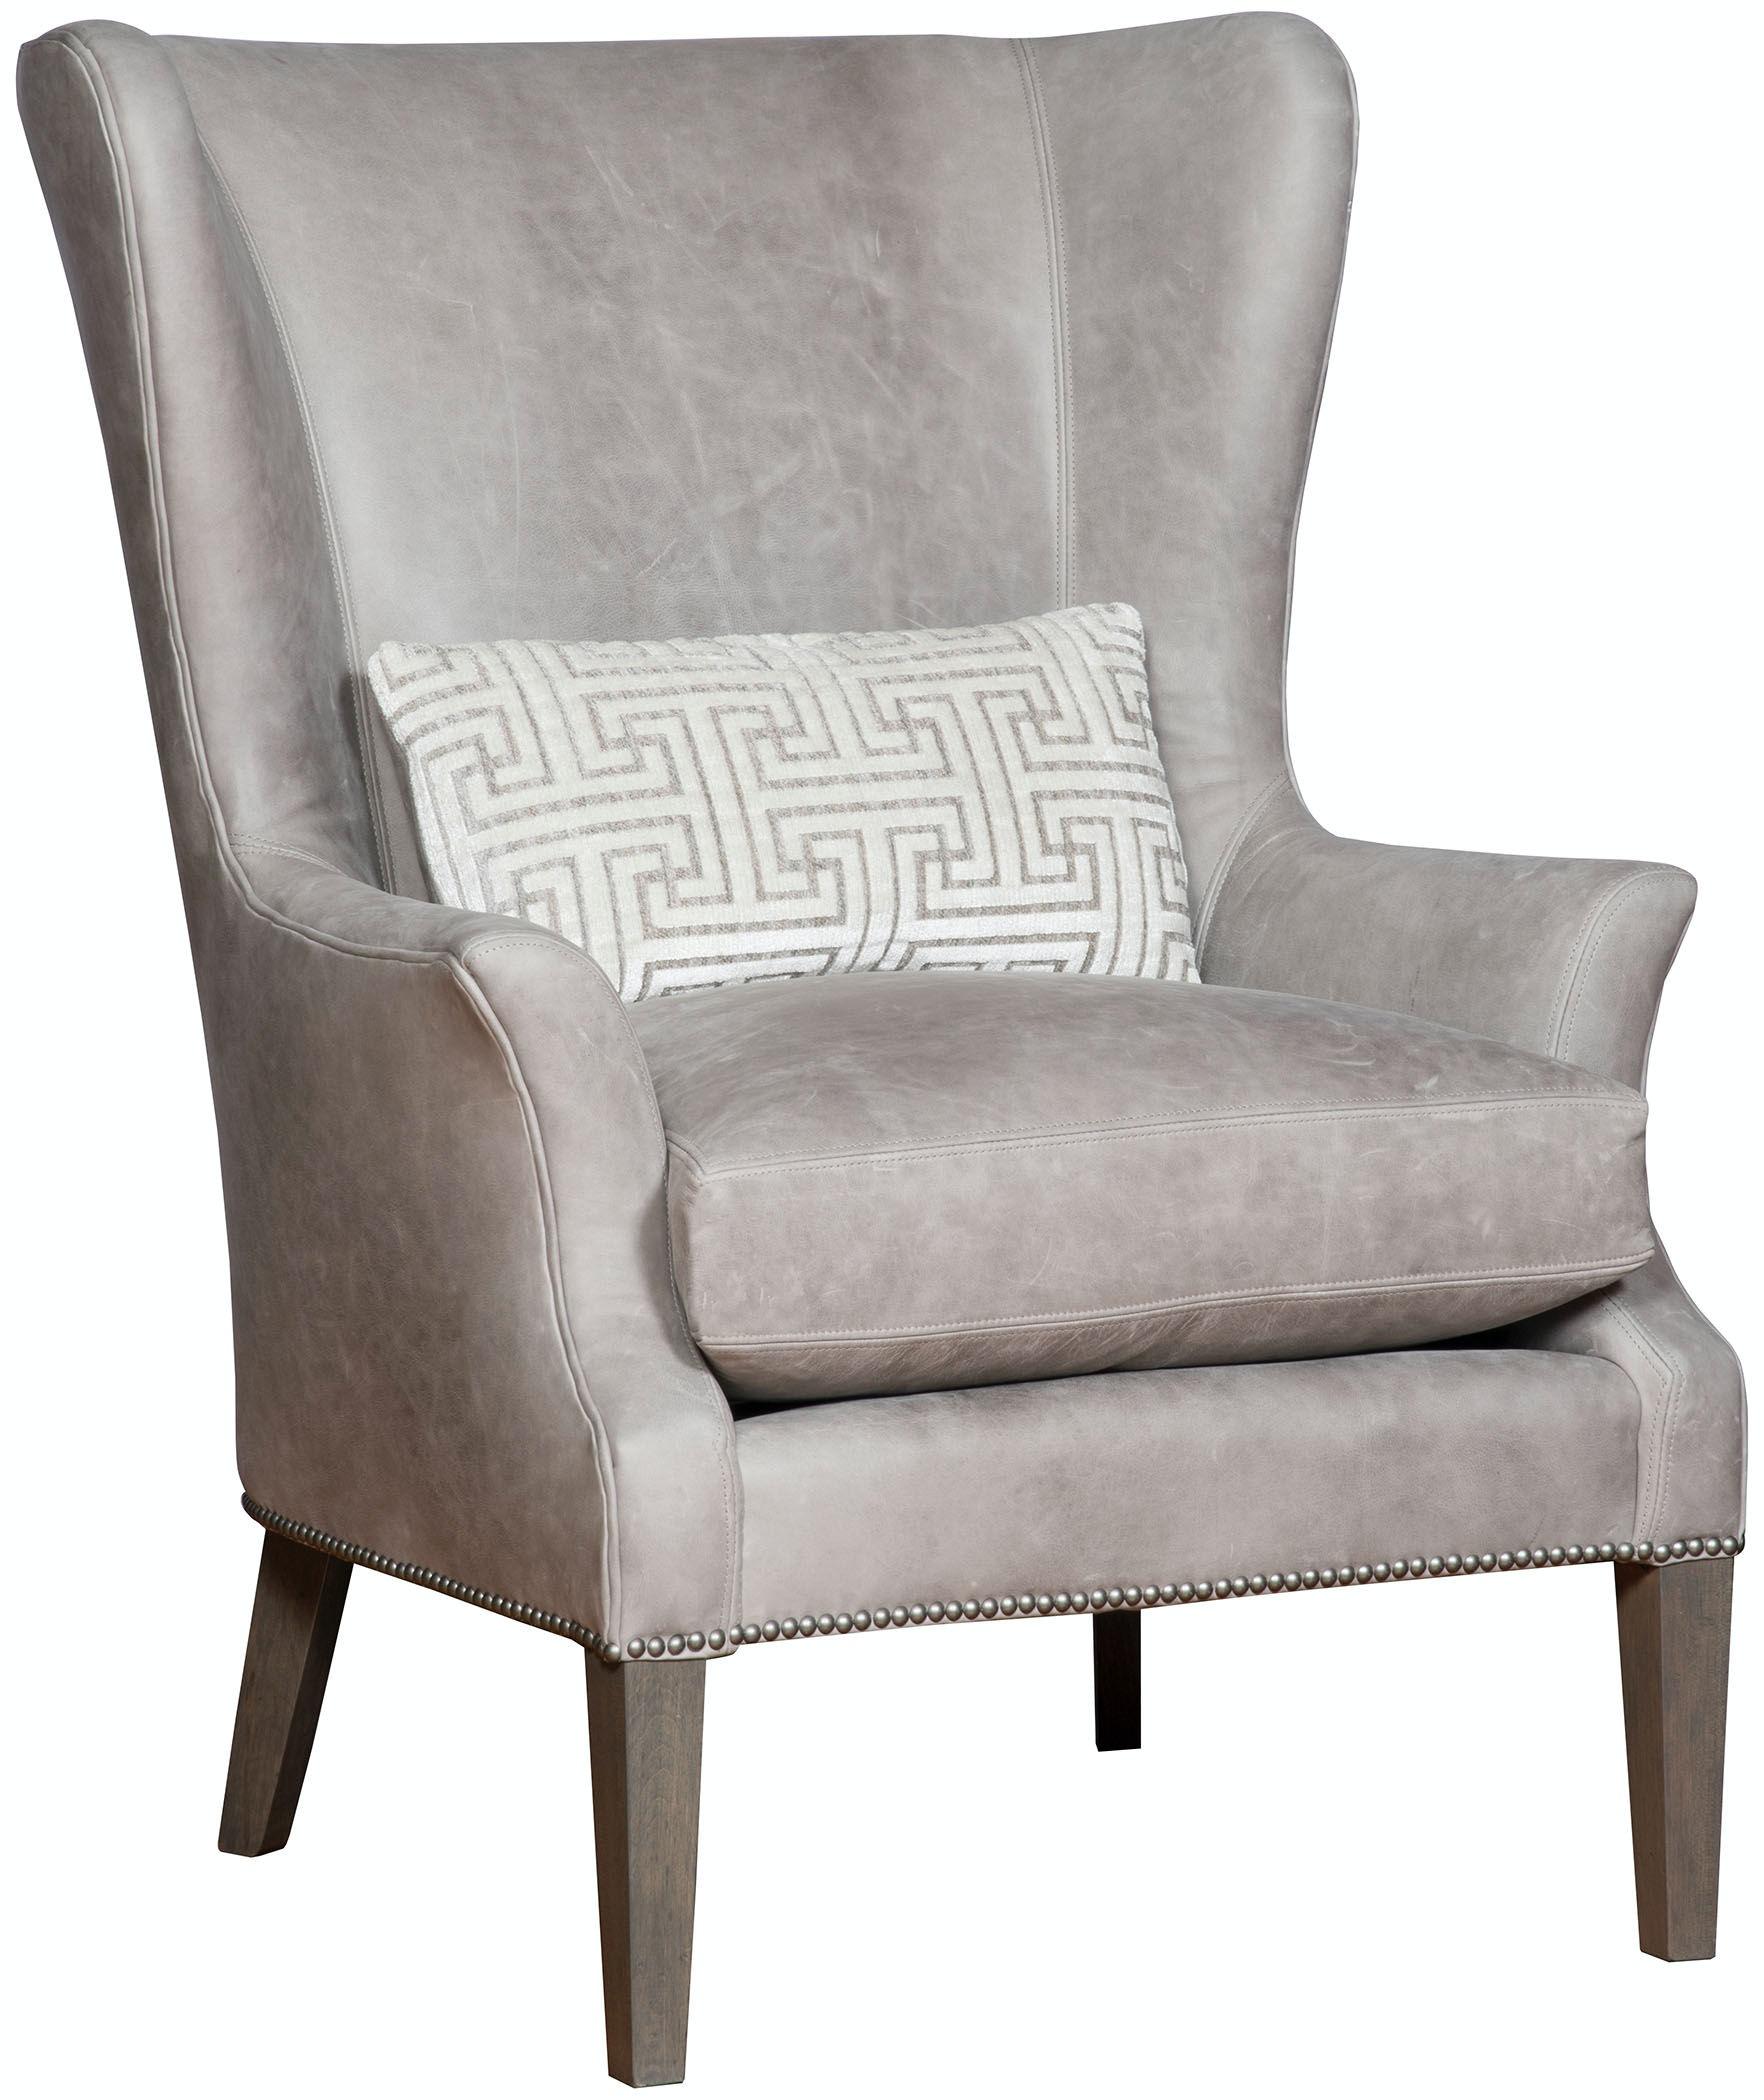 Merveilleux Lynchu0027s Furniture